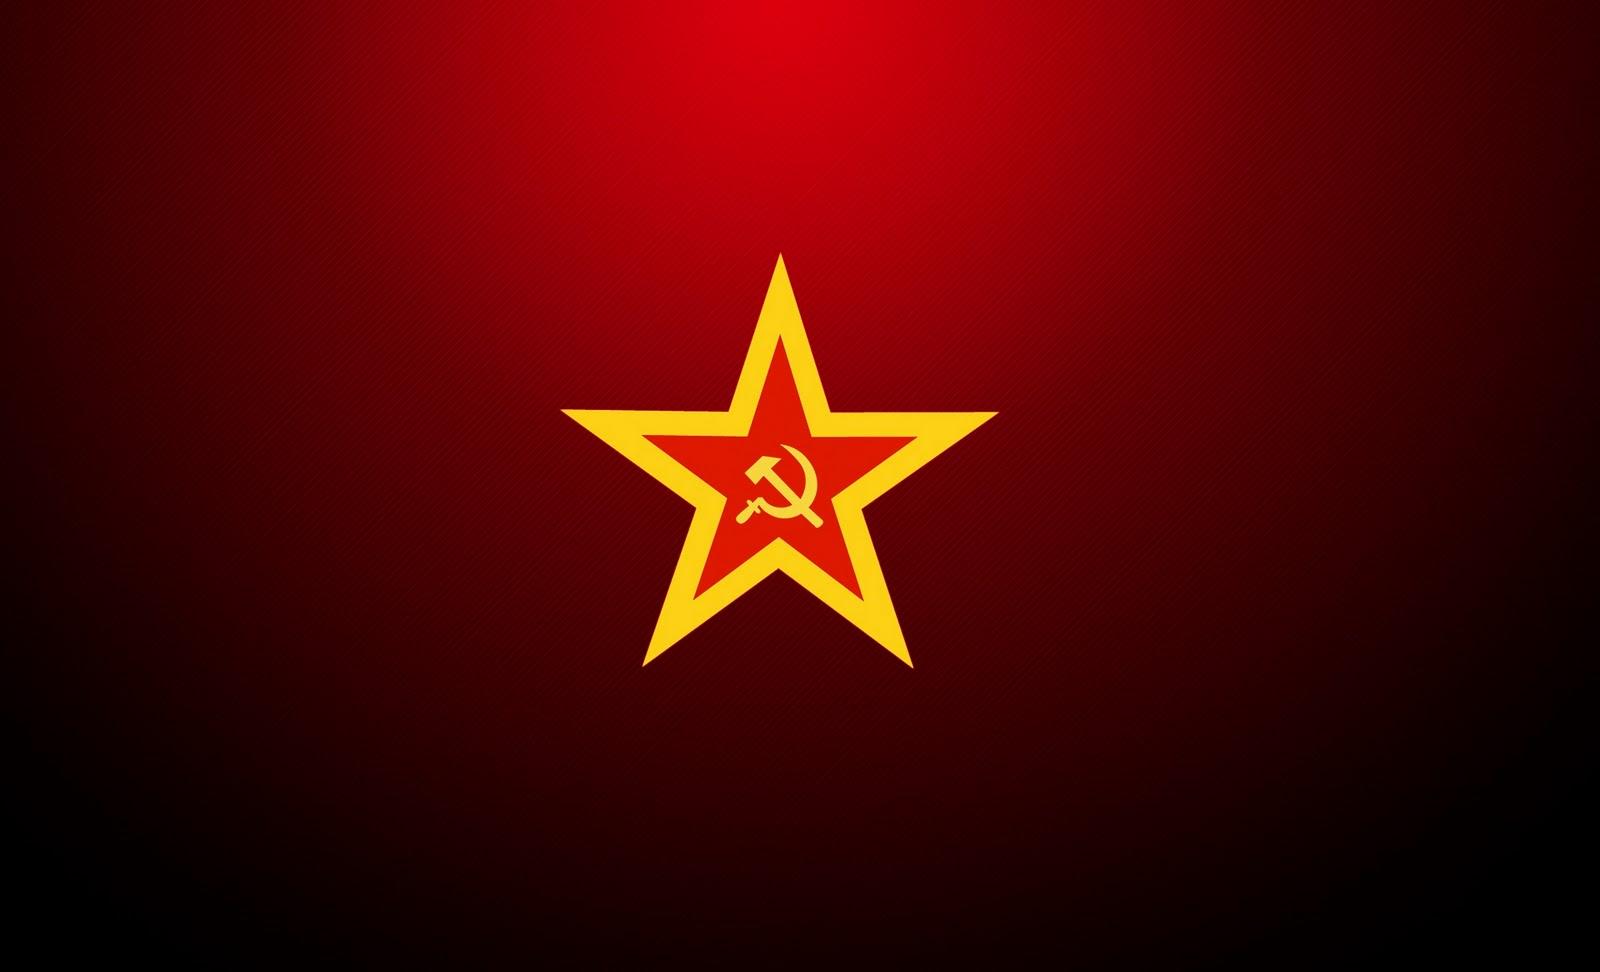 http://1.bp.blogspot.com/_2UbsSBz9ckE/S7FB_RitFBI/AAAAAAAABJM/Oo9mgNA08iw/s1600/Be_Red_Russia_HD.jpg